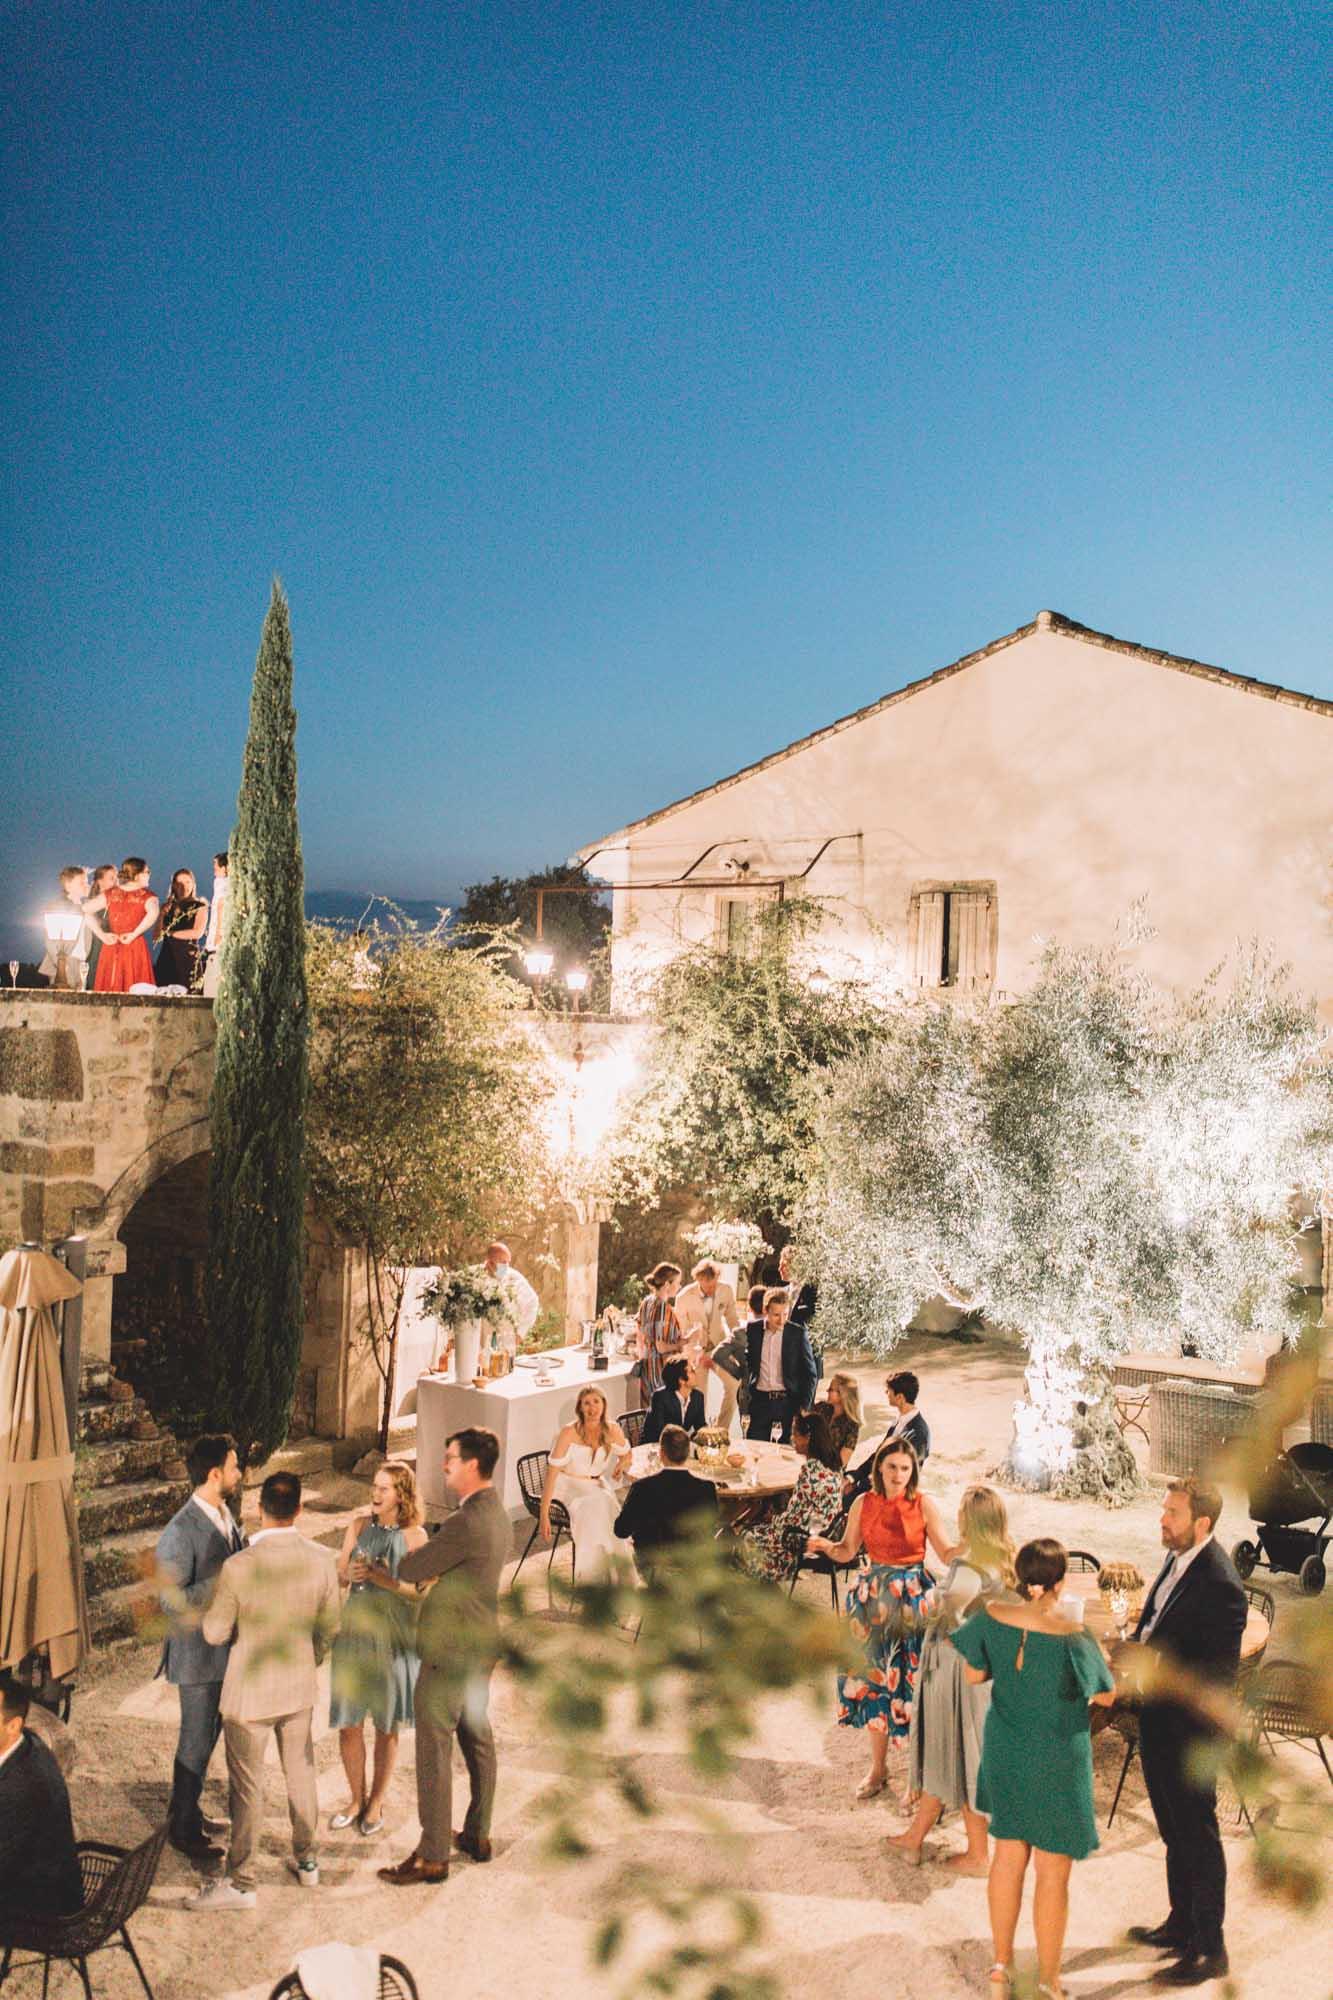 KATHARINA + DIMITRI_DOMAINES DE PATRAS_PHOTOGRAPHE MARIAGE_LES BANDITS-17